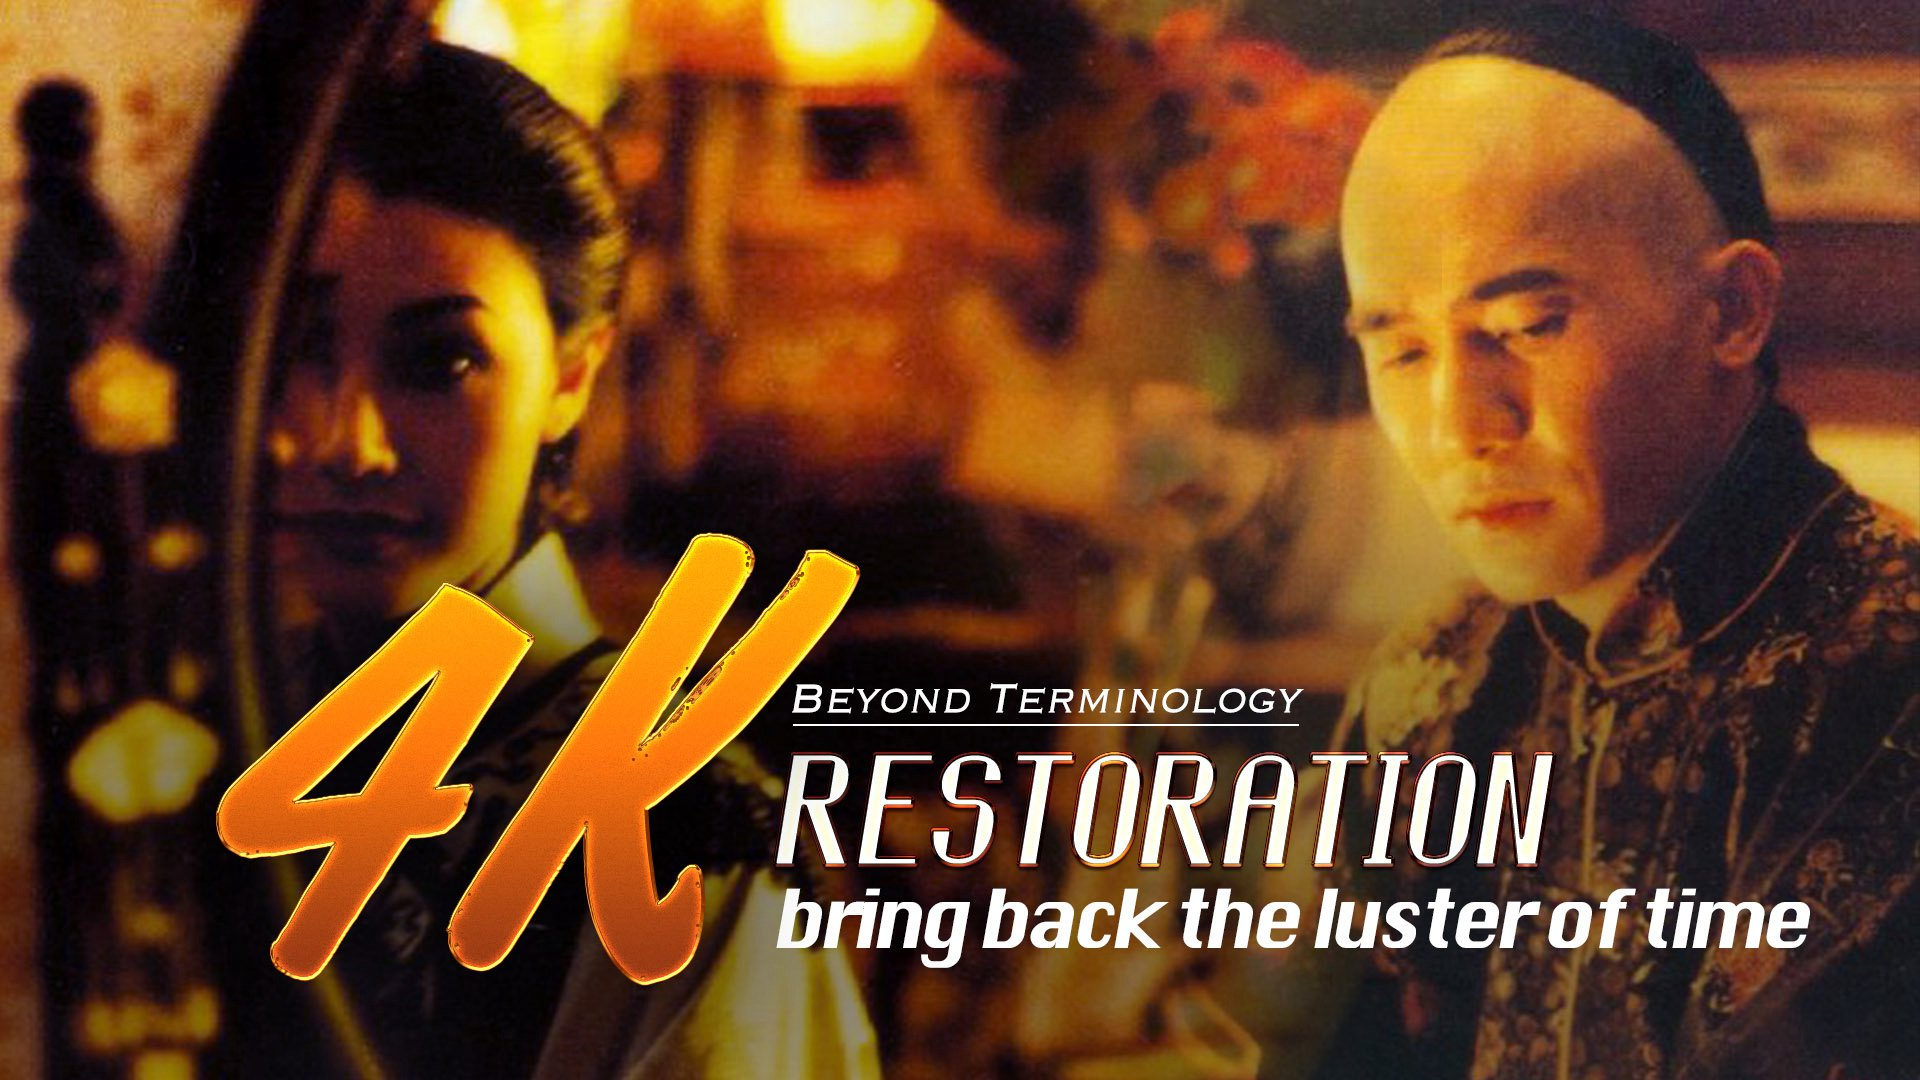 Beyond Terminology: 4K restoration brings back the luster of time